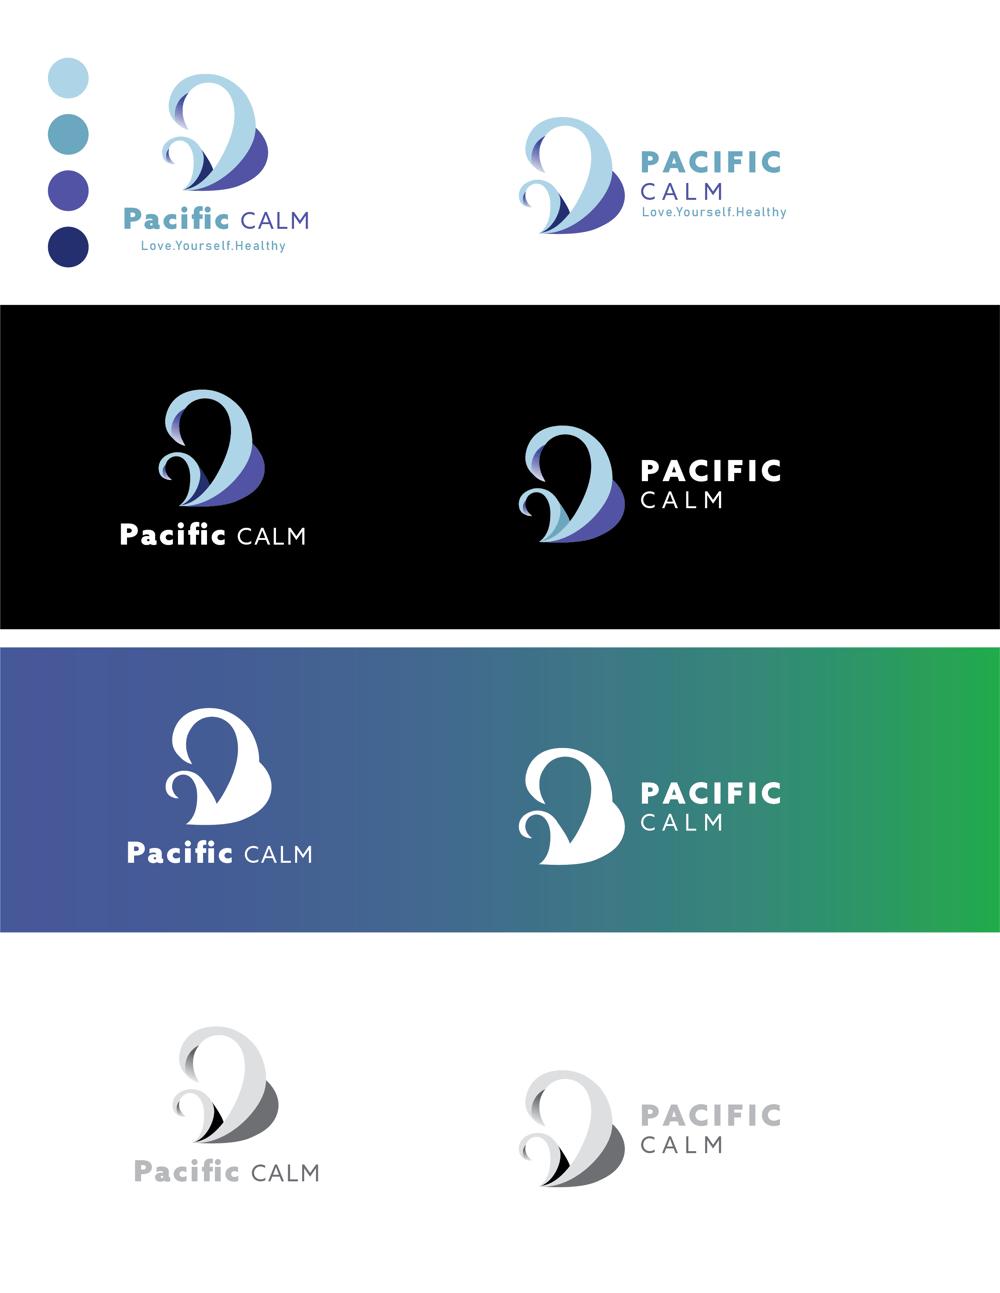 Pacific Calm - logo design - image 1 - student project